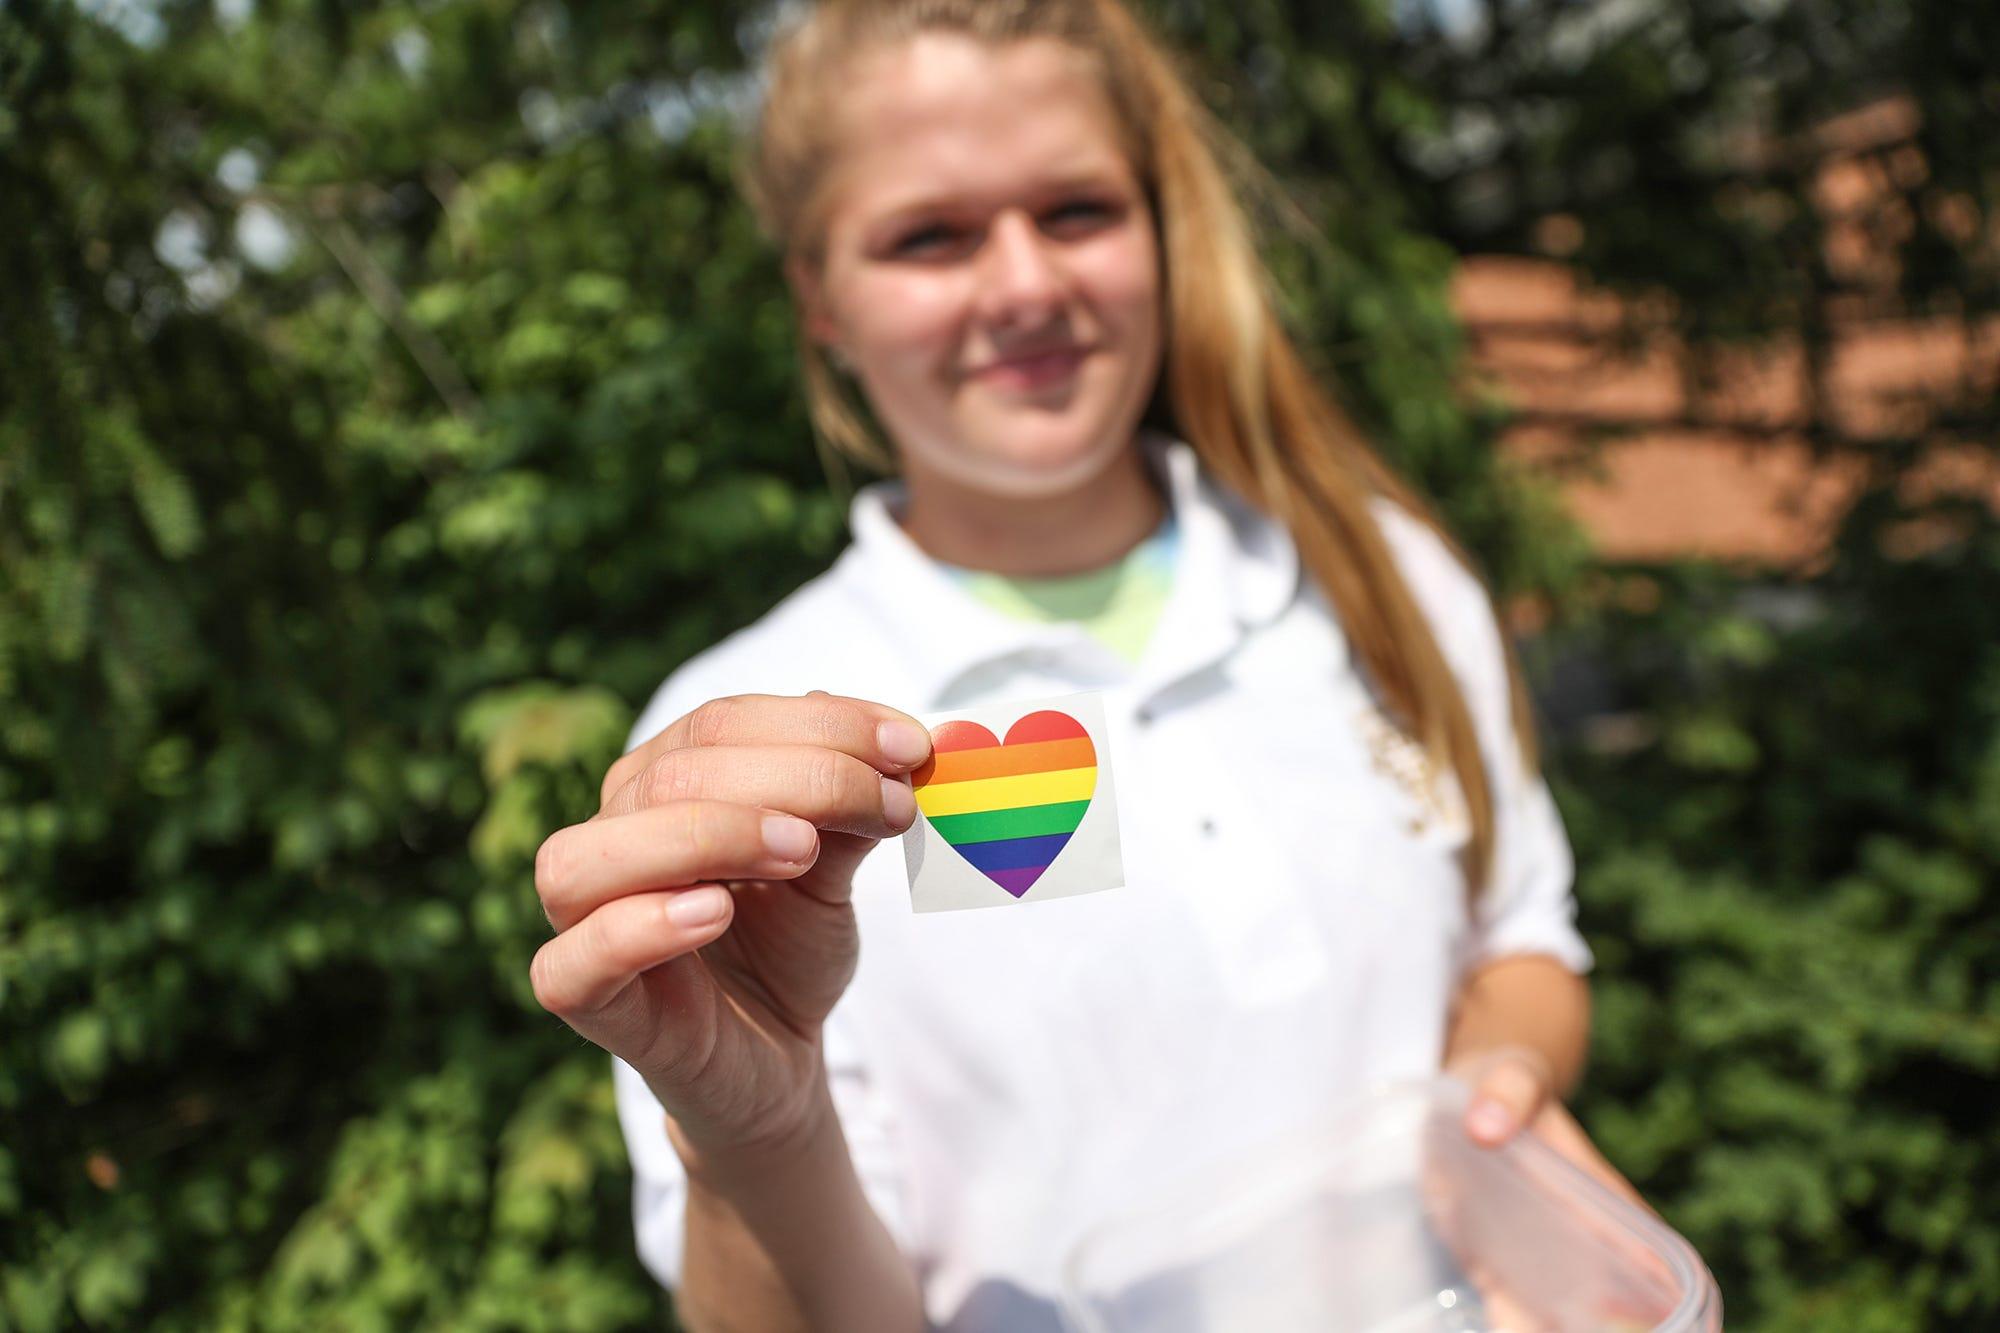 Lesbian Guidance Counselor 2 - Hot Movie-3600